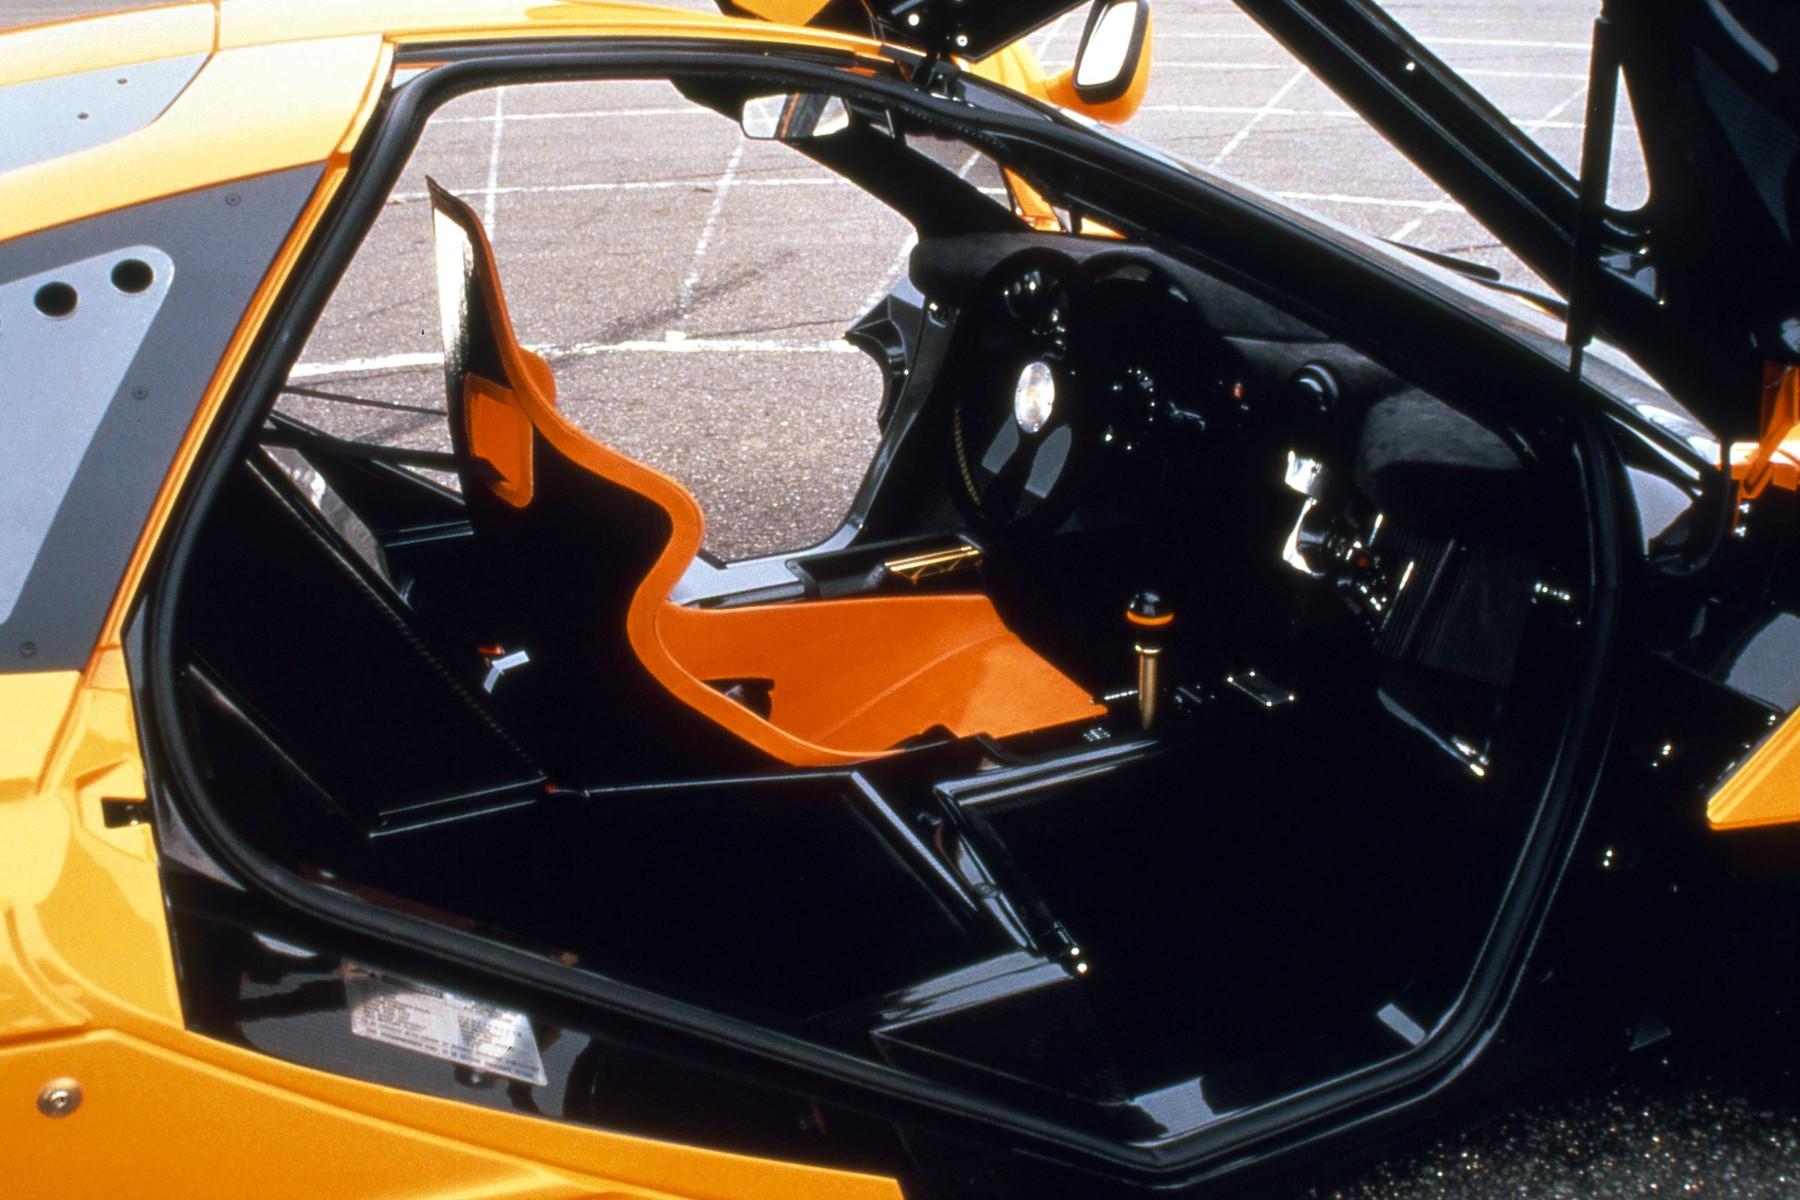 McLaren Teases Stunning F1 Inspired Hyper GT Coming In